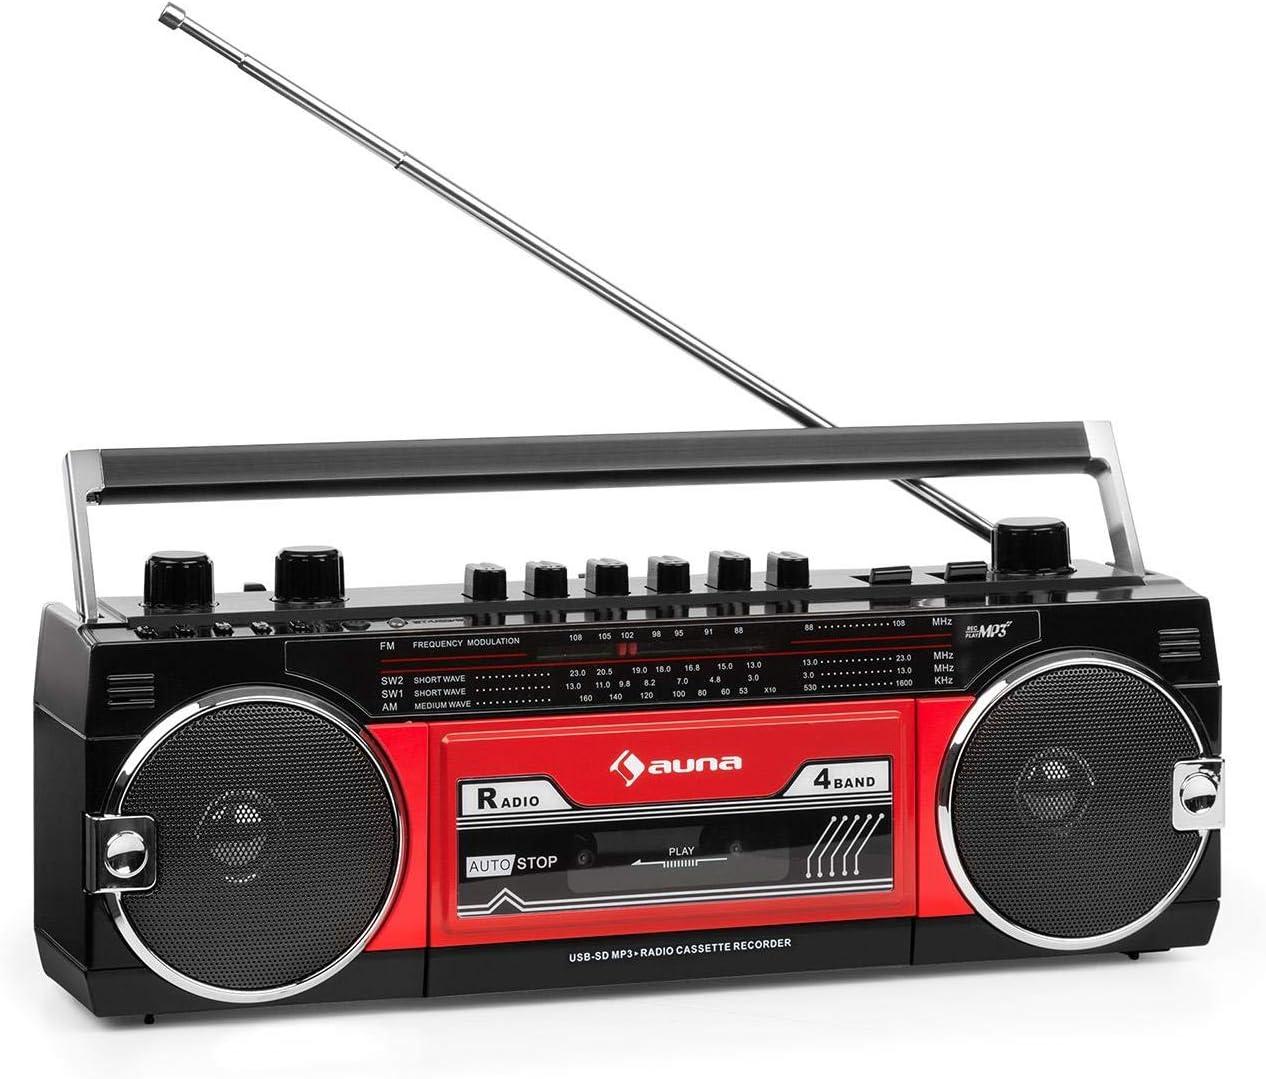 Auna Duke MKII Radiocasete - Bluetooth , Codificación Directa del Cassette al USB/SD , 4 Bandas Radio: FM, MW, SW1, SW2 , Antena telescópica , USB , Ranura SD, Enchufe y Hueco para Pilas , Negra/roja